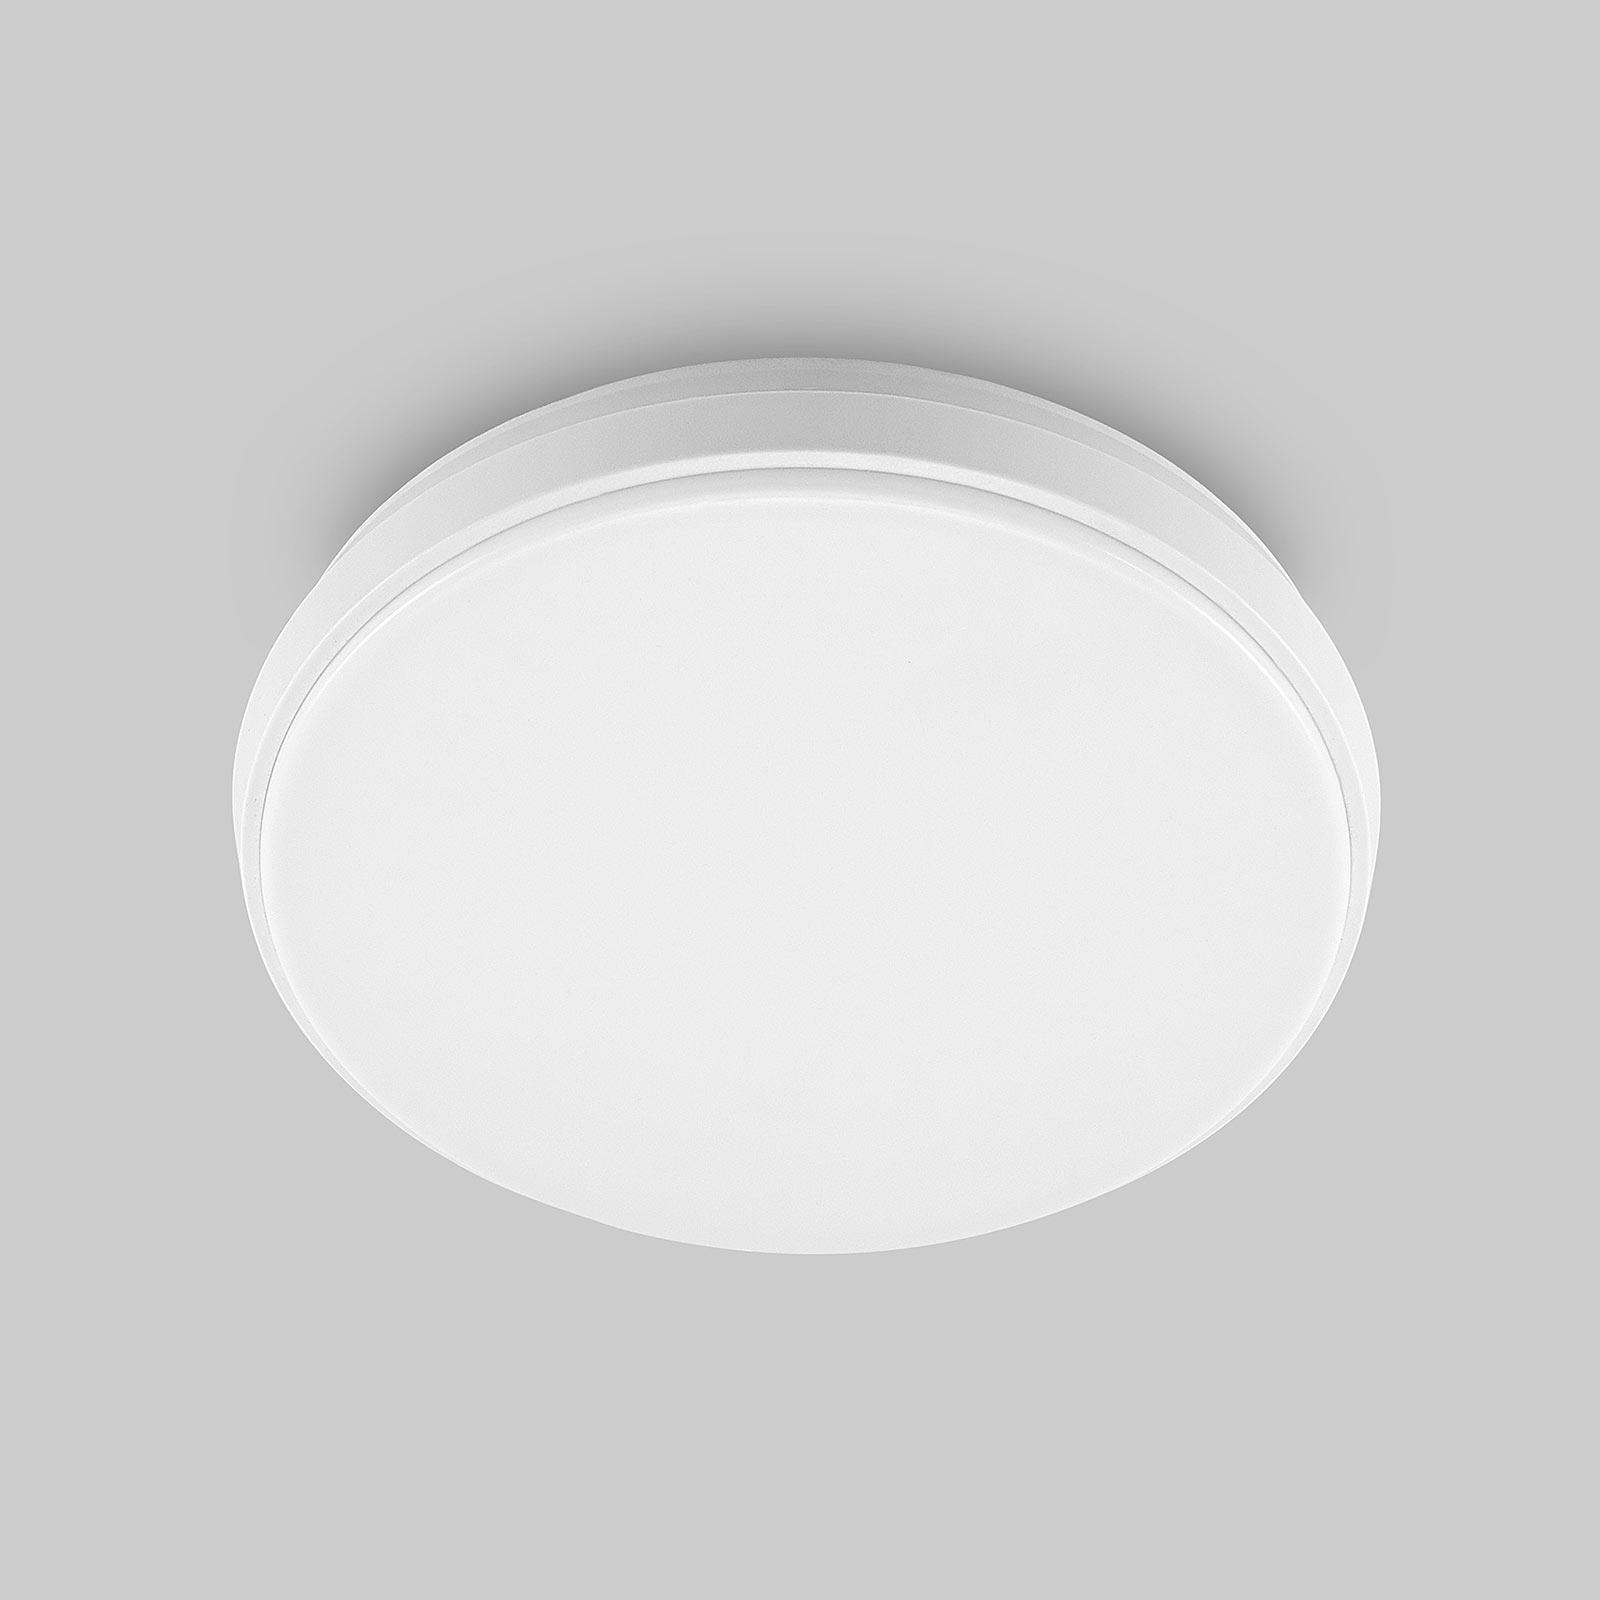 Arcchio Brady LED plafondlamp, wit, rond, 25 cm